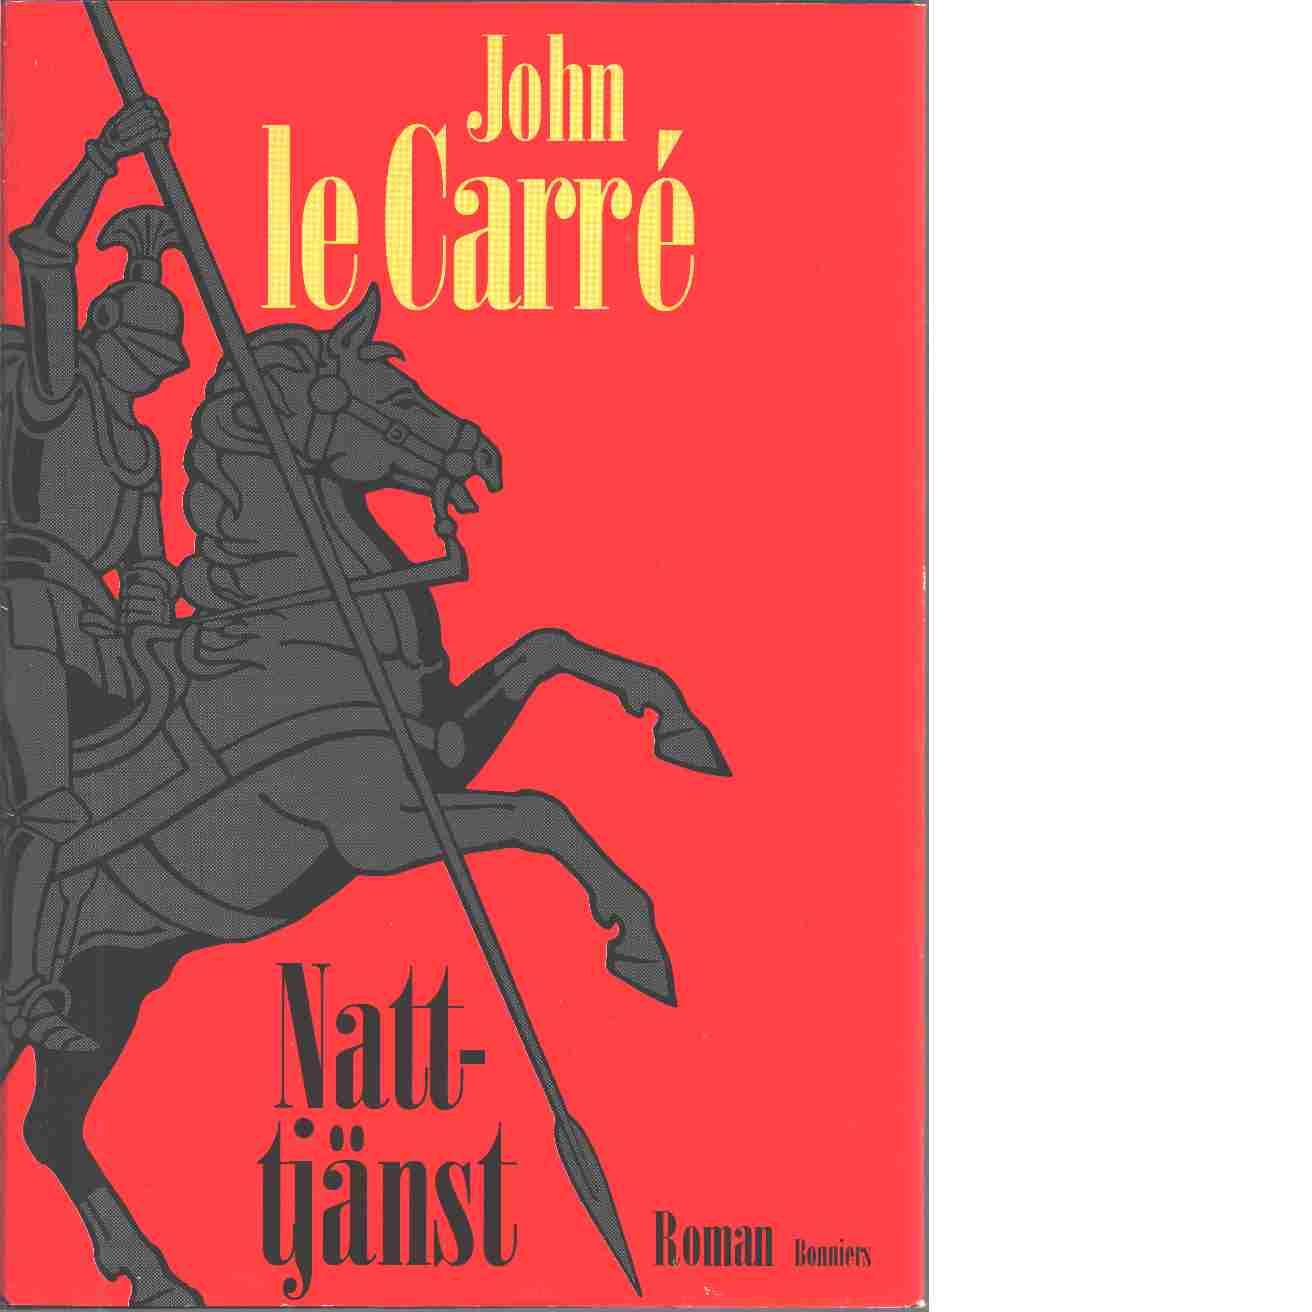 Nattjänst - Carré, le John